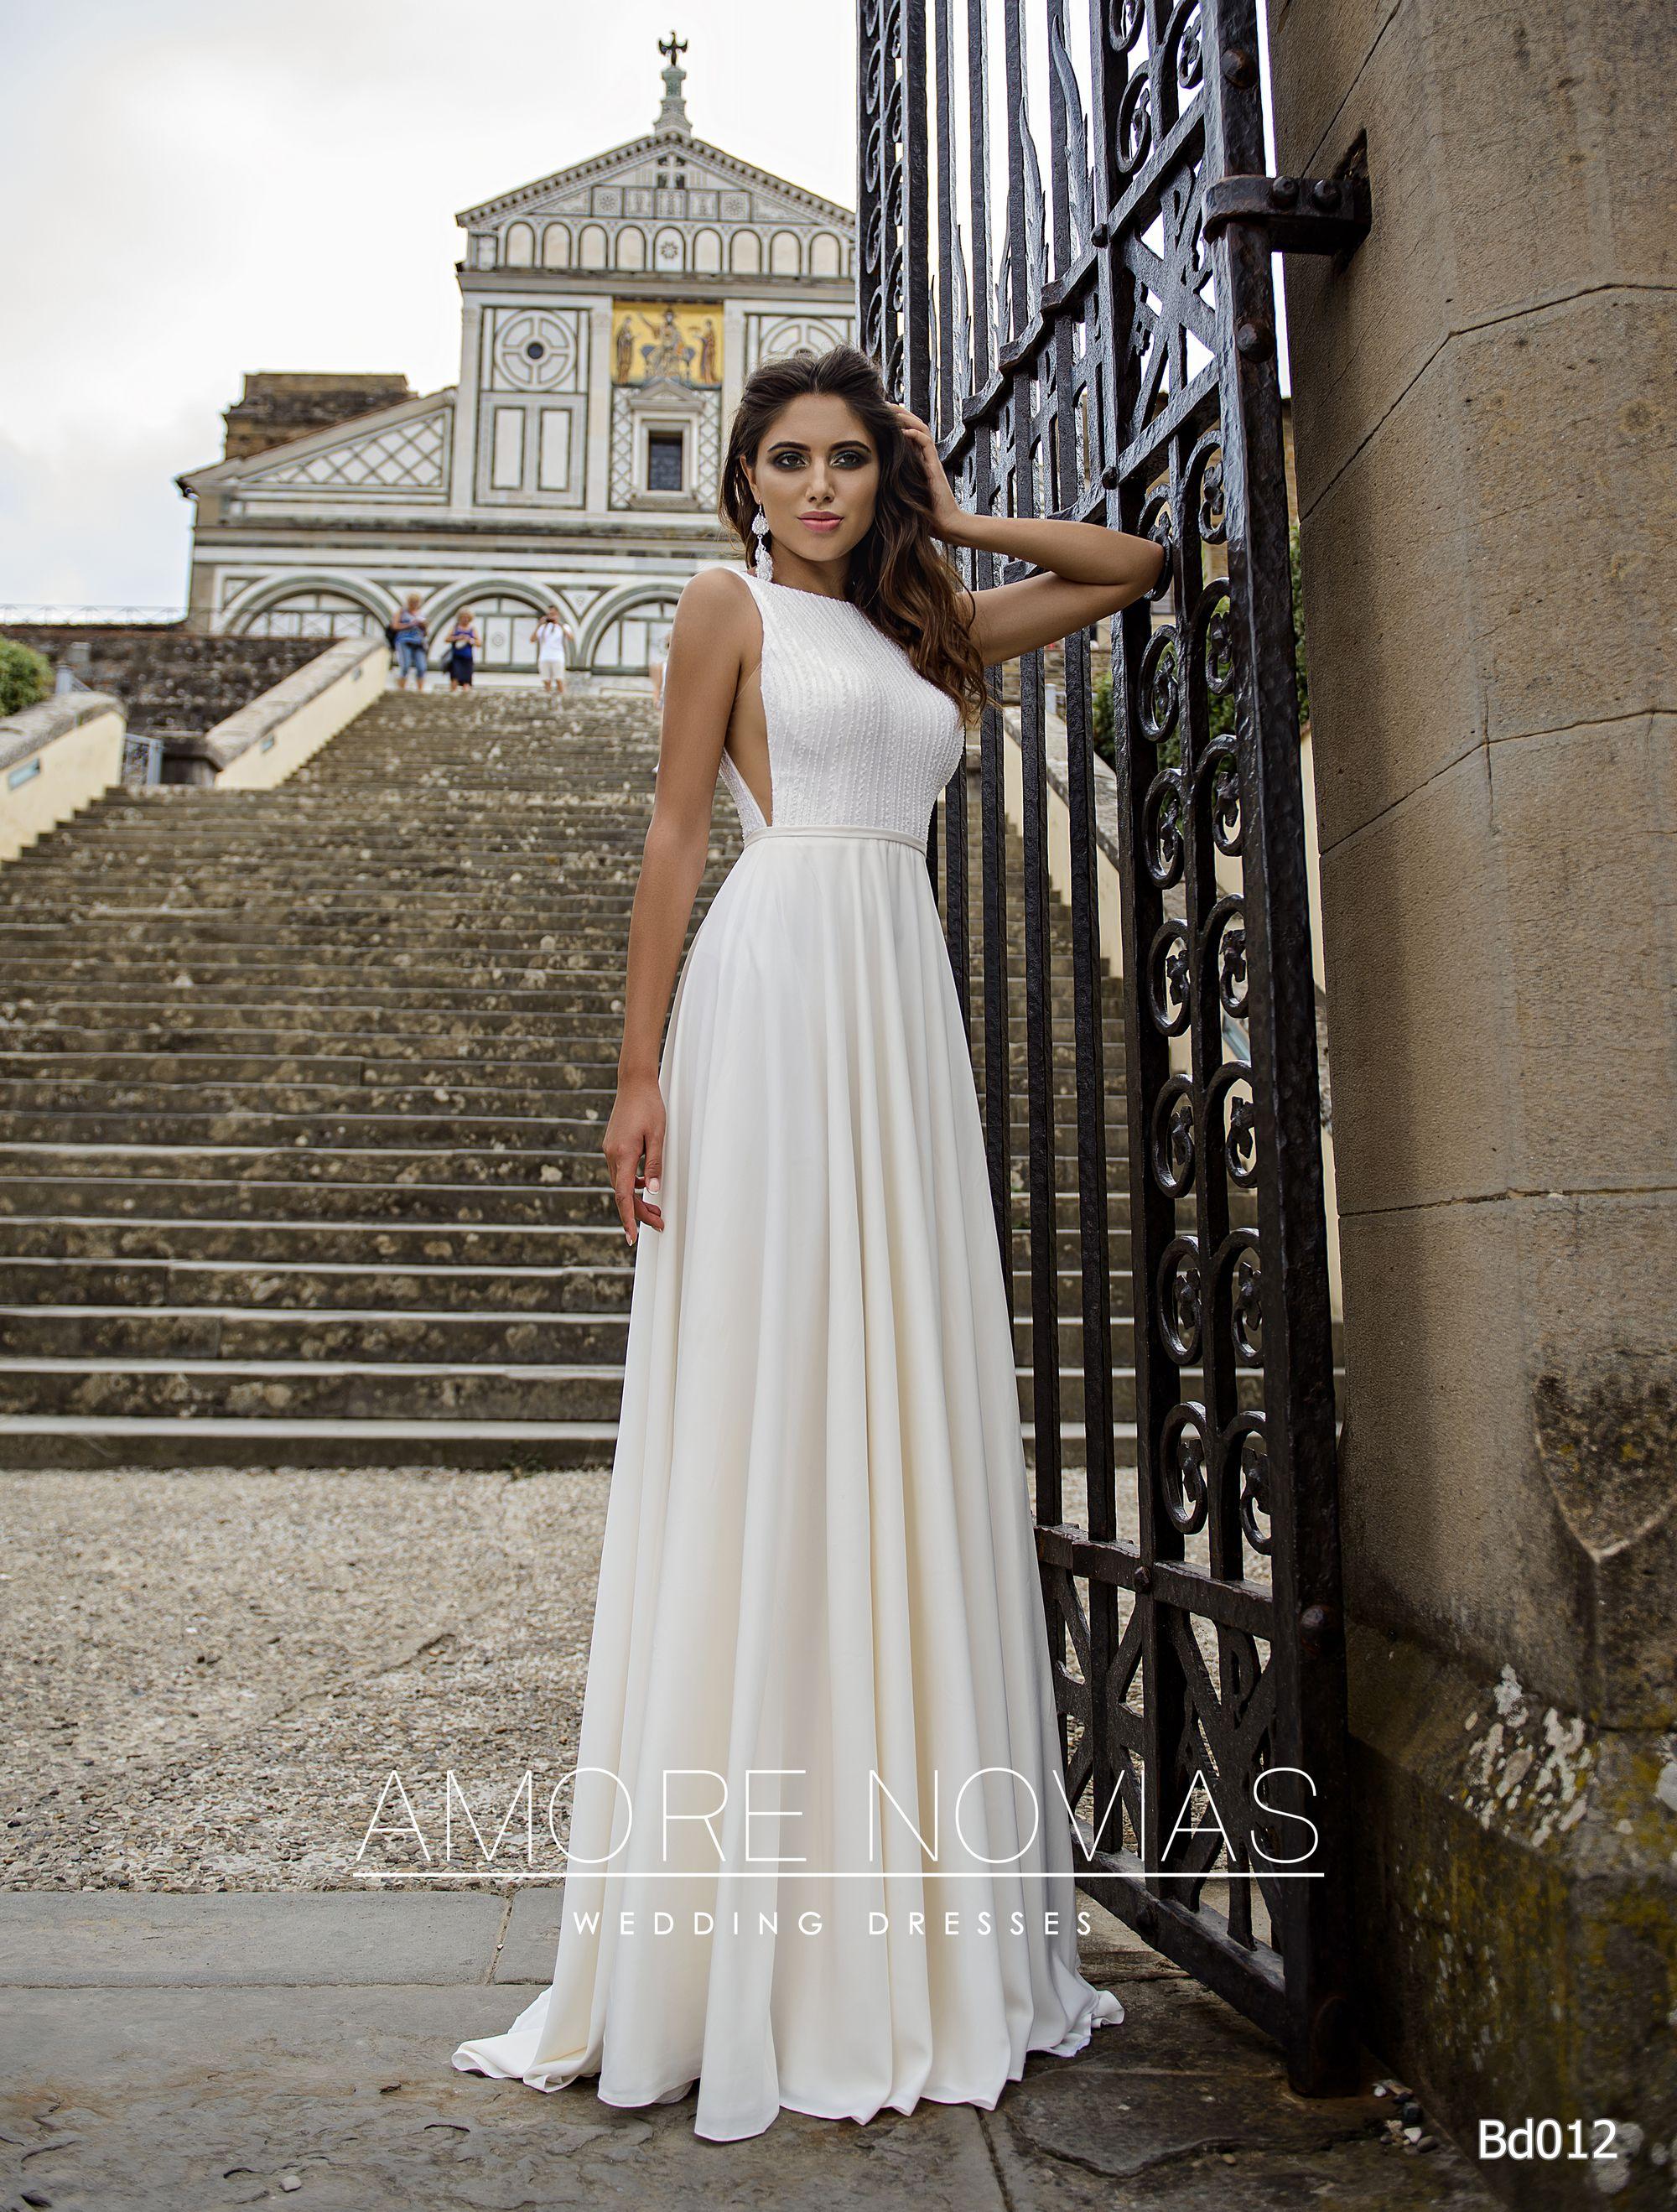 https://amore-novias.com/images/stories/virtuemart/product/bd012-------(1).jpg